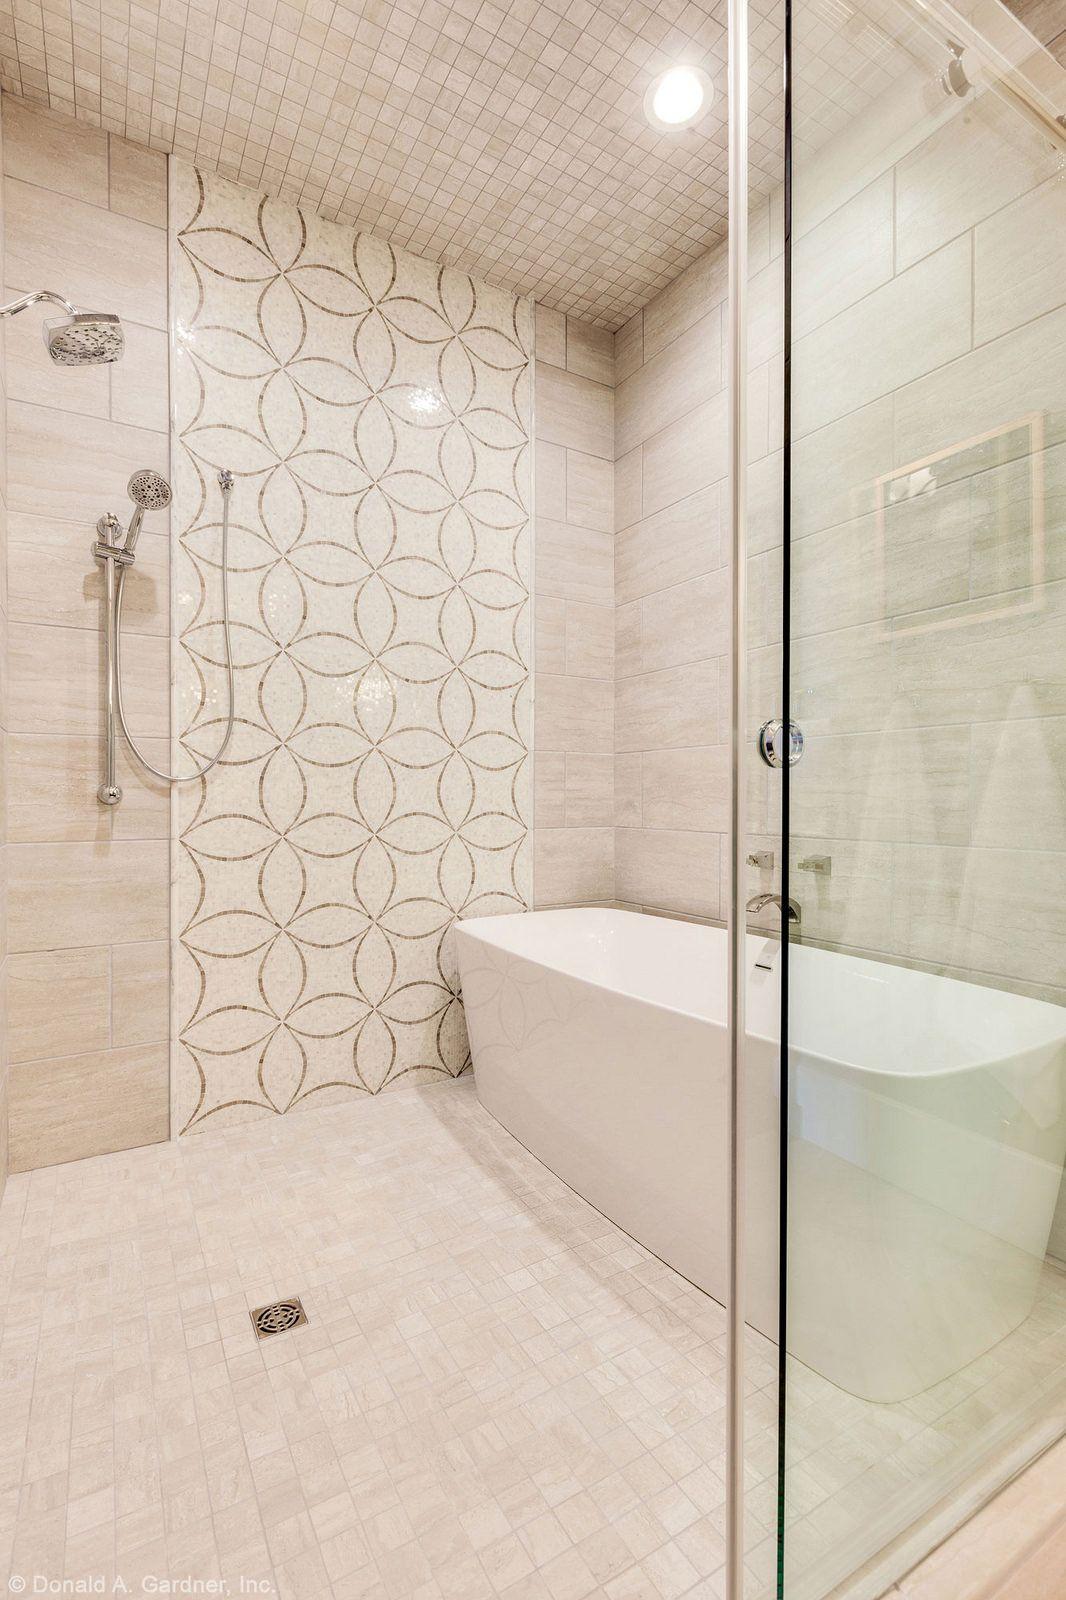 Plan #1211 - The Rangemoss | Small bathroom, Walk in ... on Wet Room With Freestanding Tub  id=75847